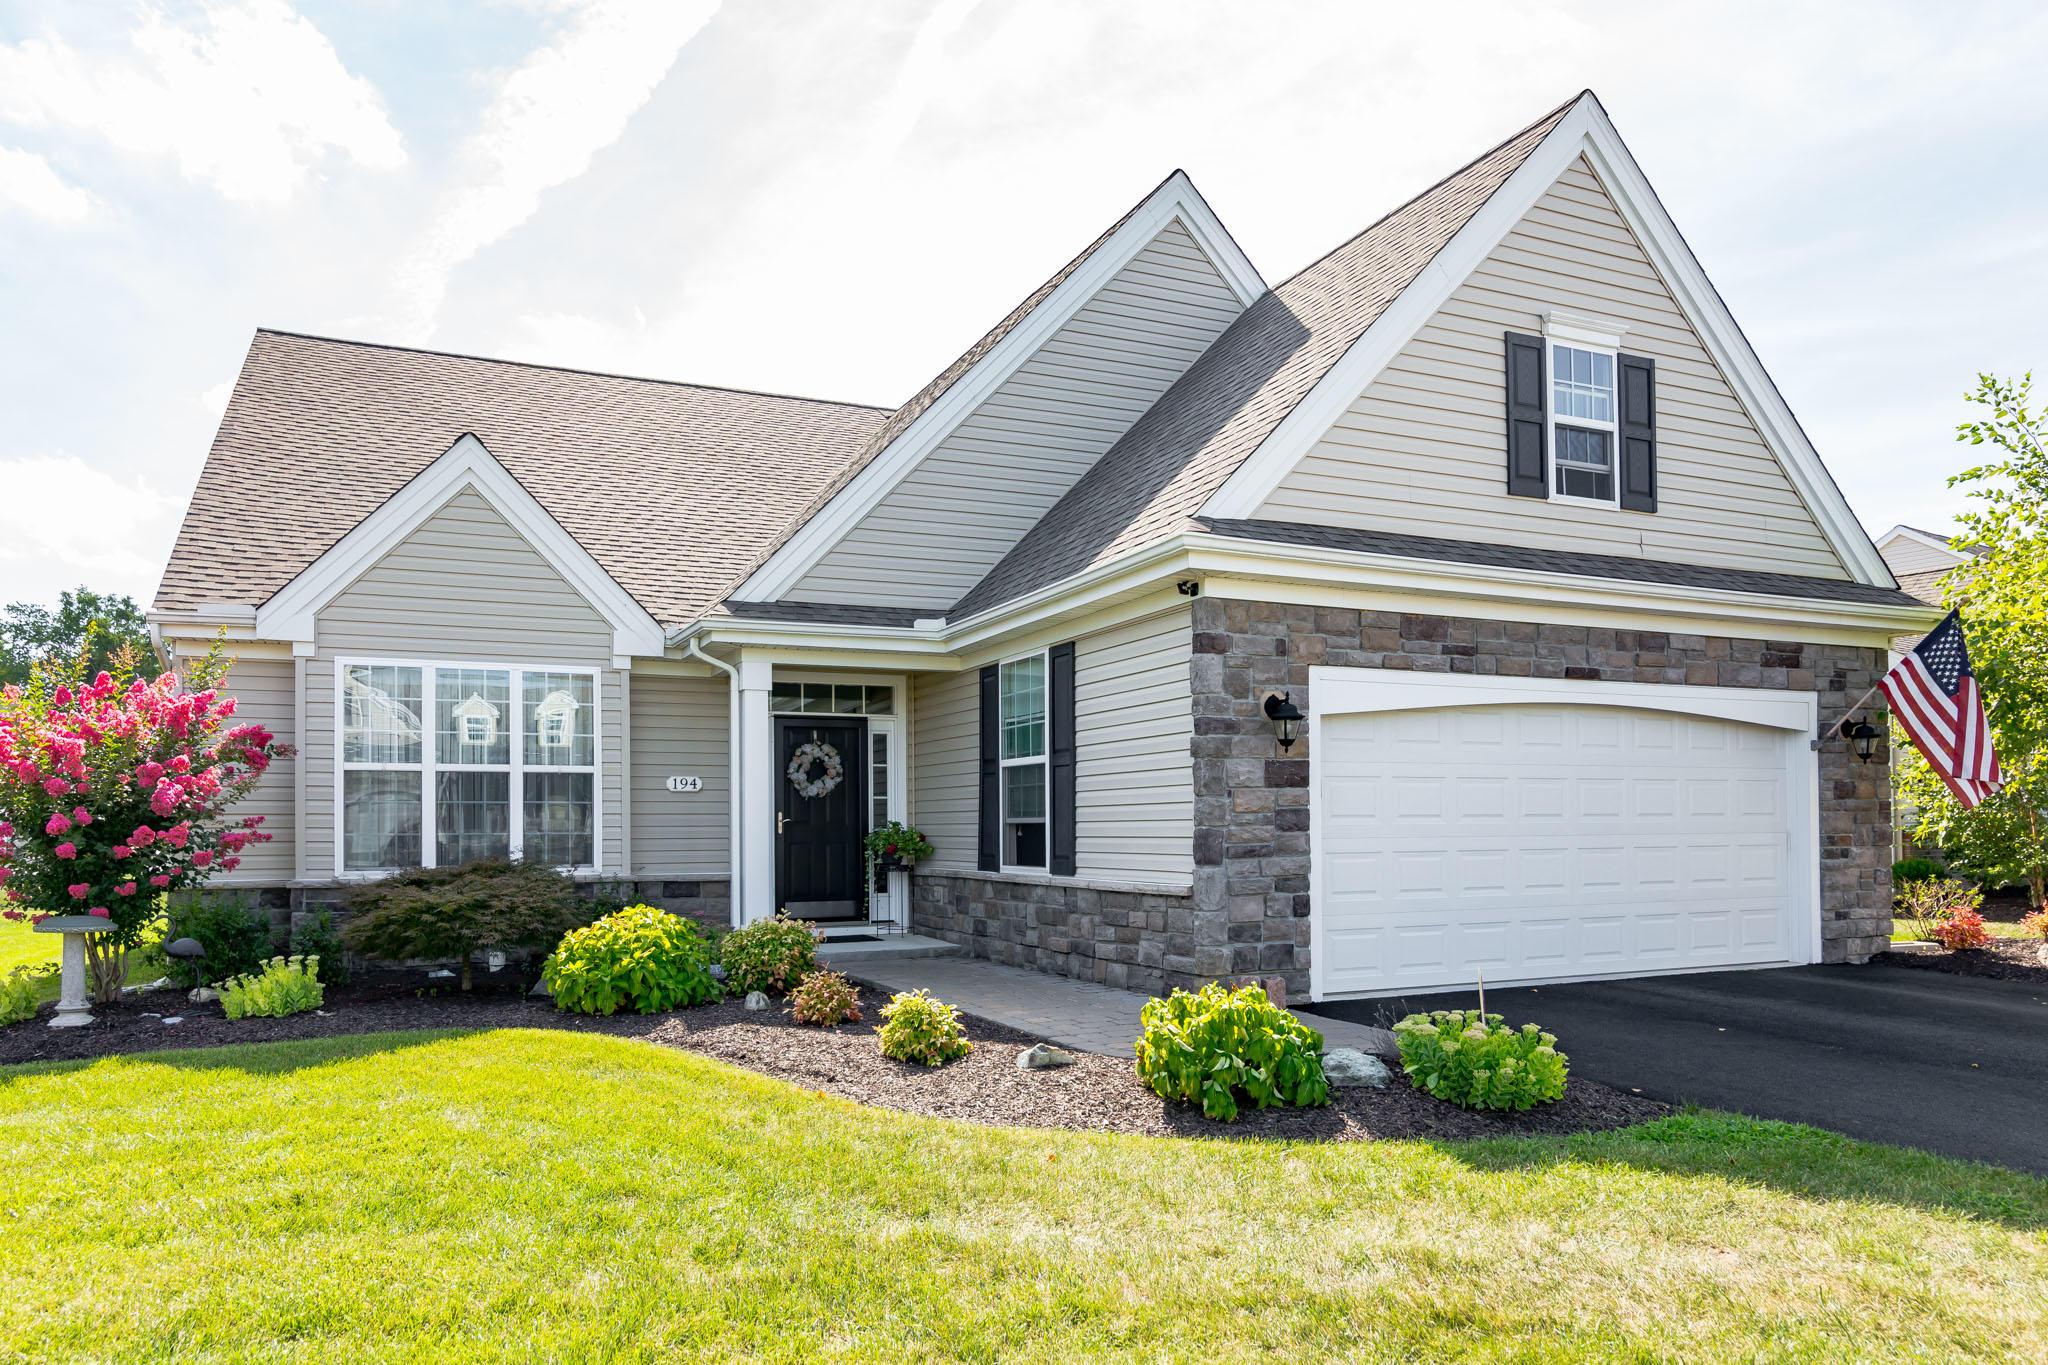 Ashland By Wilkinson Homes Llc New Homes For Sale Smyrna De